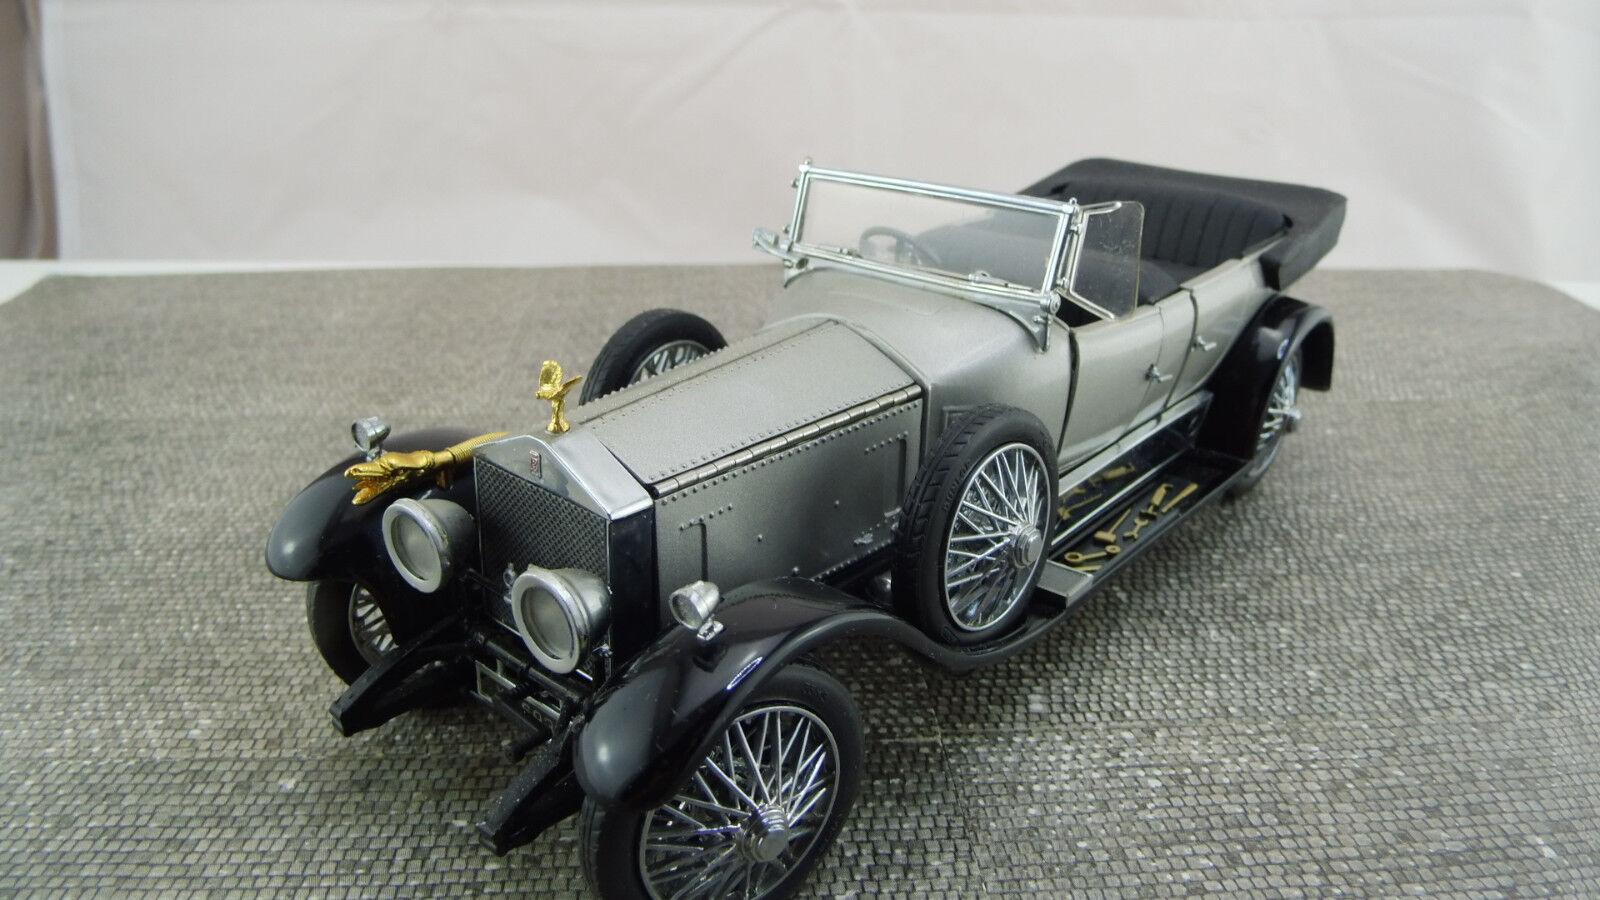 Franklin Mint Mint Mint 1 24 1925 Rolls Royce plata Ghost a 640 buen estado 0e1fef